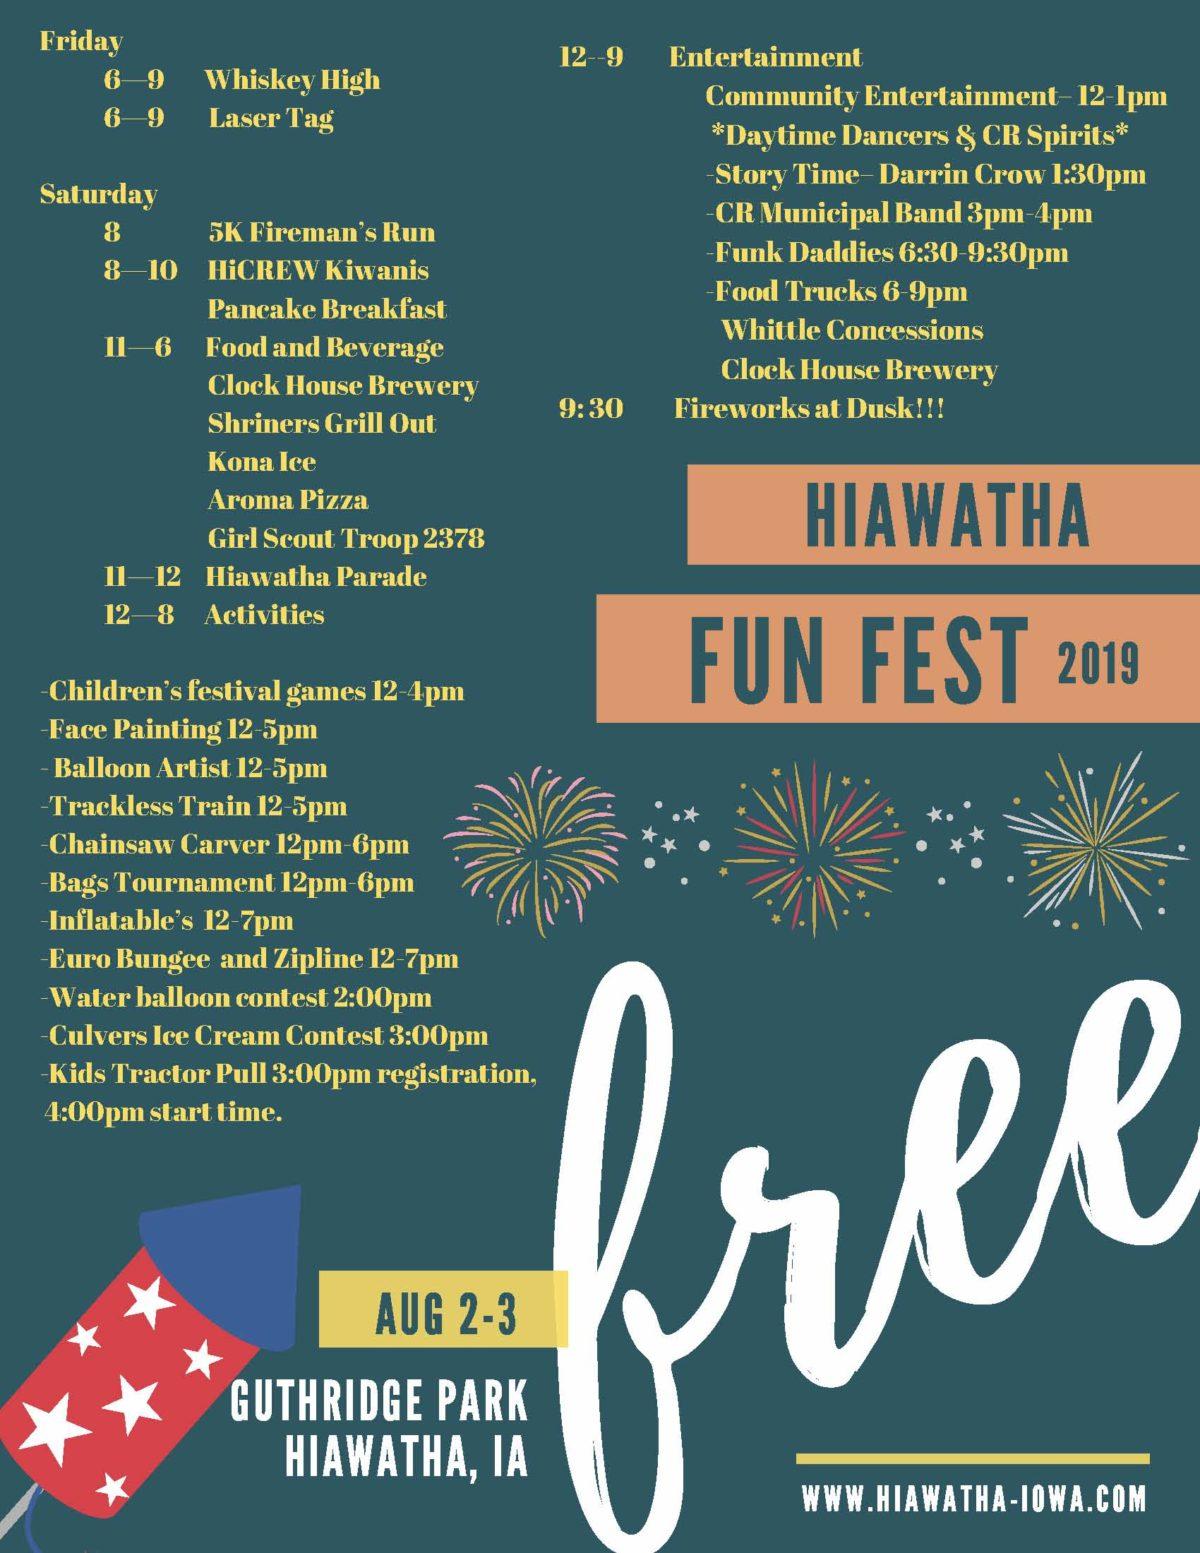 Hiawatha Fun Fest 2019